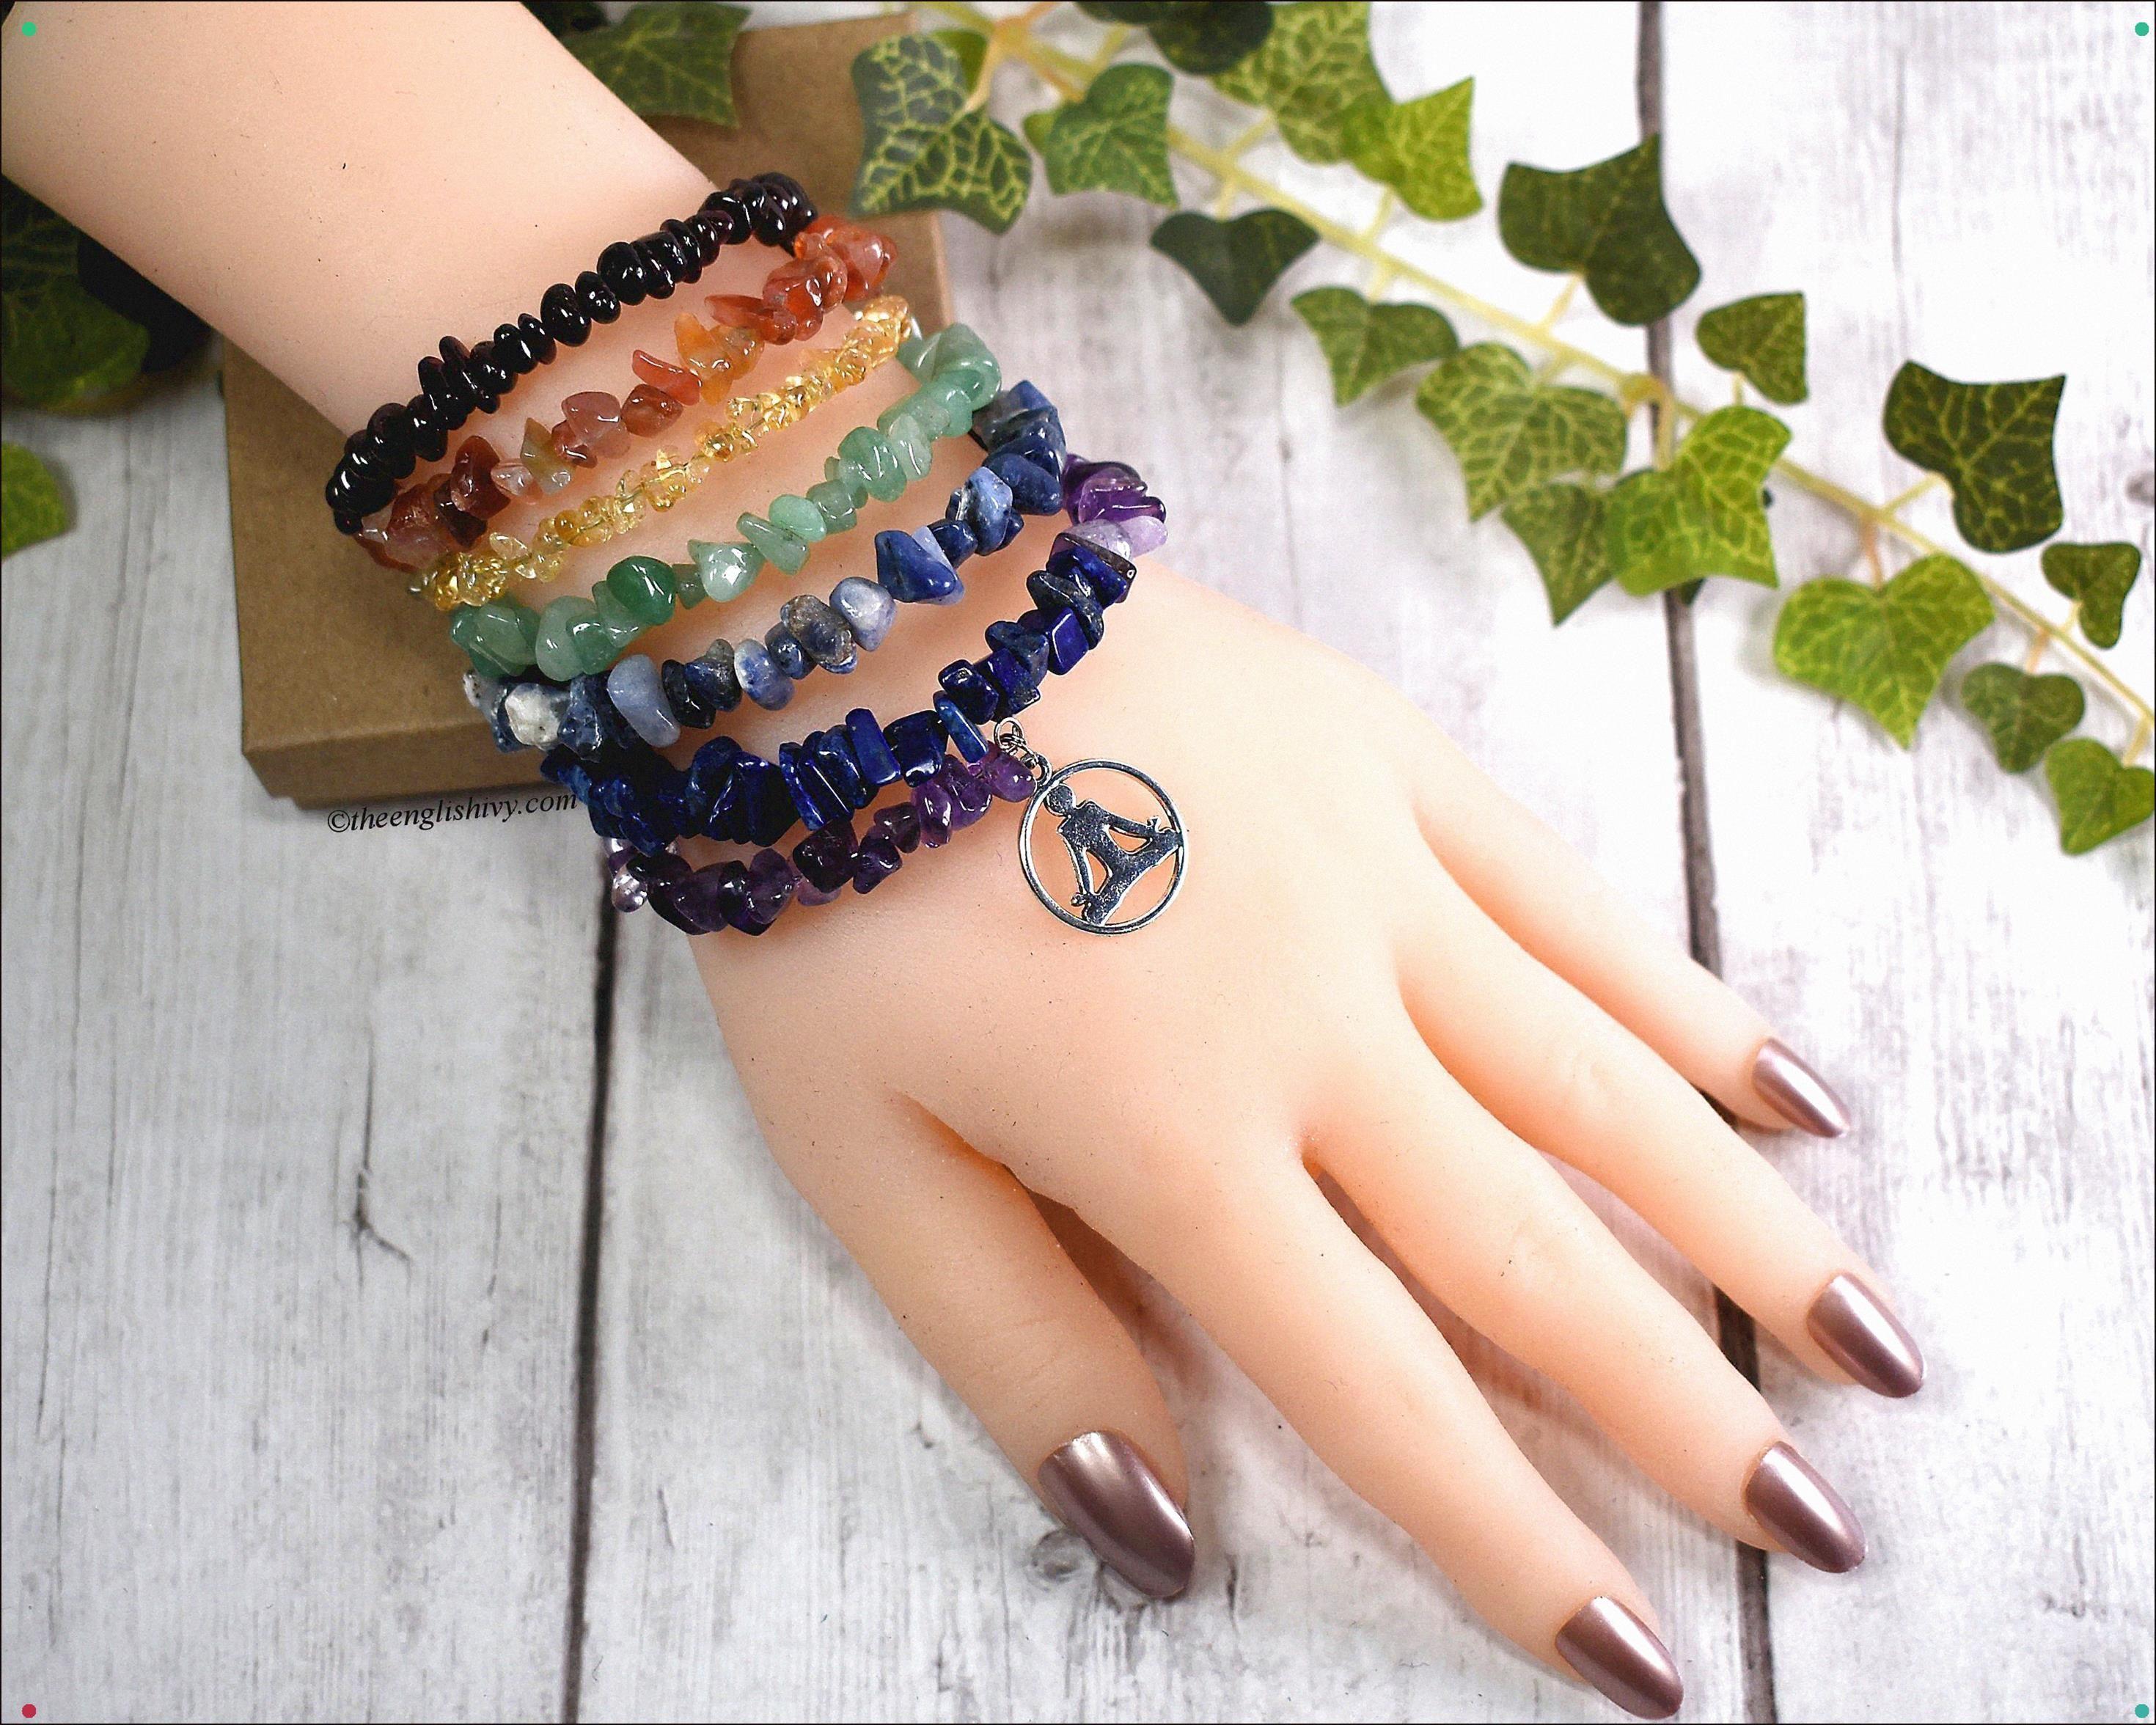 Whichever Chakra You Feel Needs Opening, The English Ivy Has You Covered With This 7 Layer Crystal Chakra Bracelet : . . . #Chakras #Meditation #Hindu #Buddhism #Crystals #Gemstones #Lotus #Yoga #Handmade #Theenglishivy #Etsy #Giftsunder30